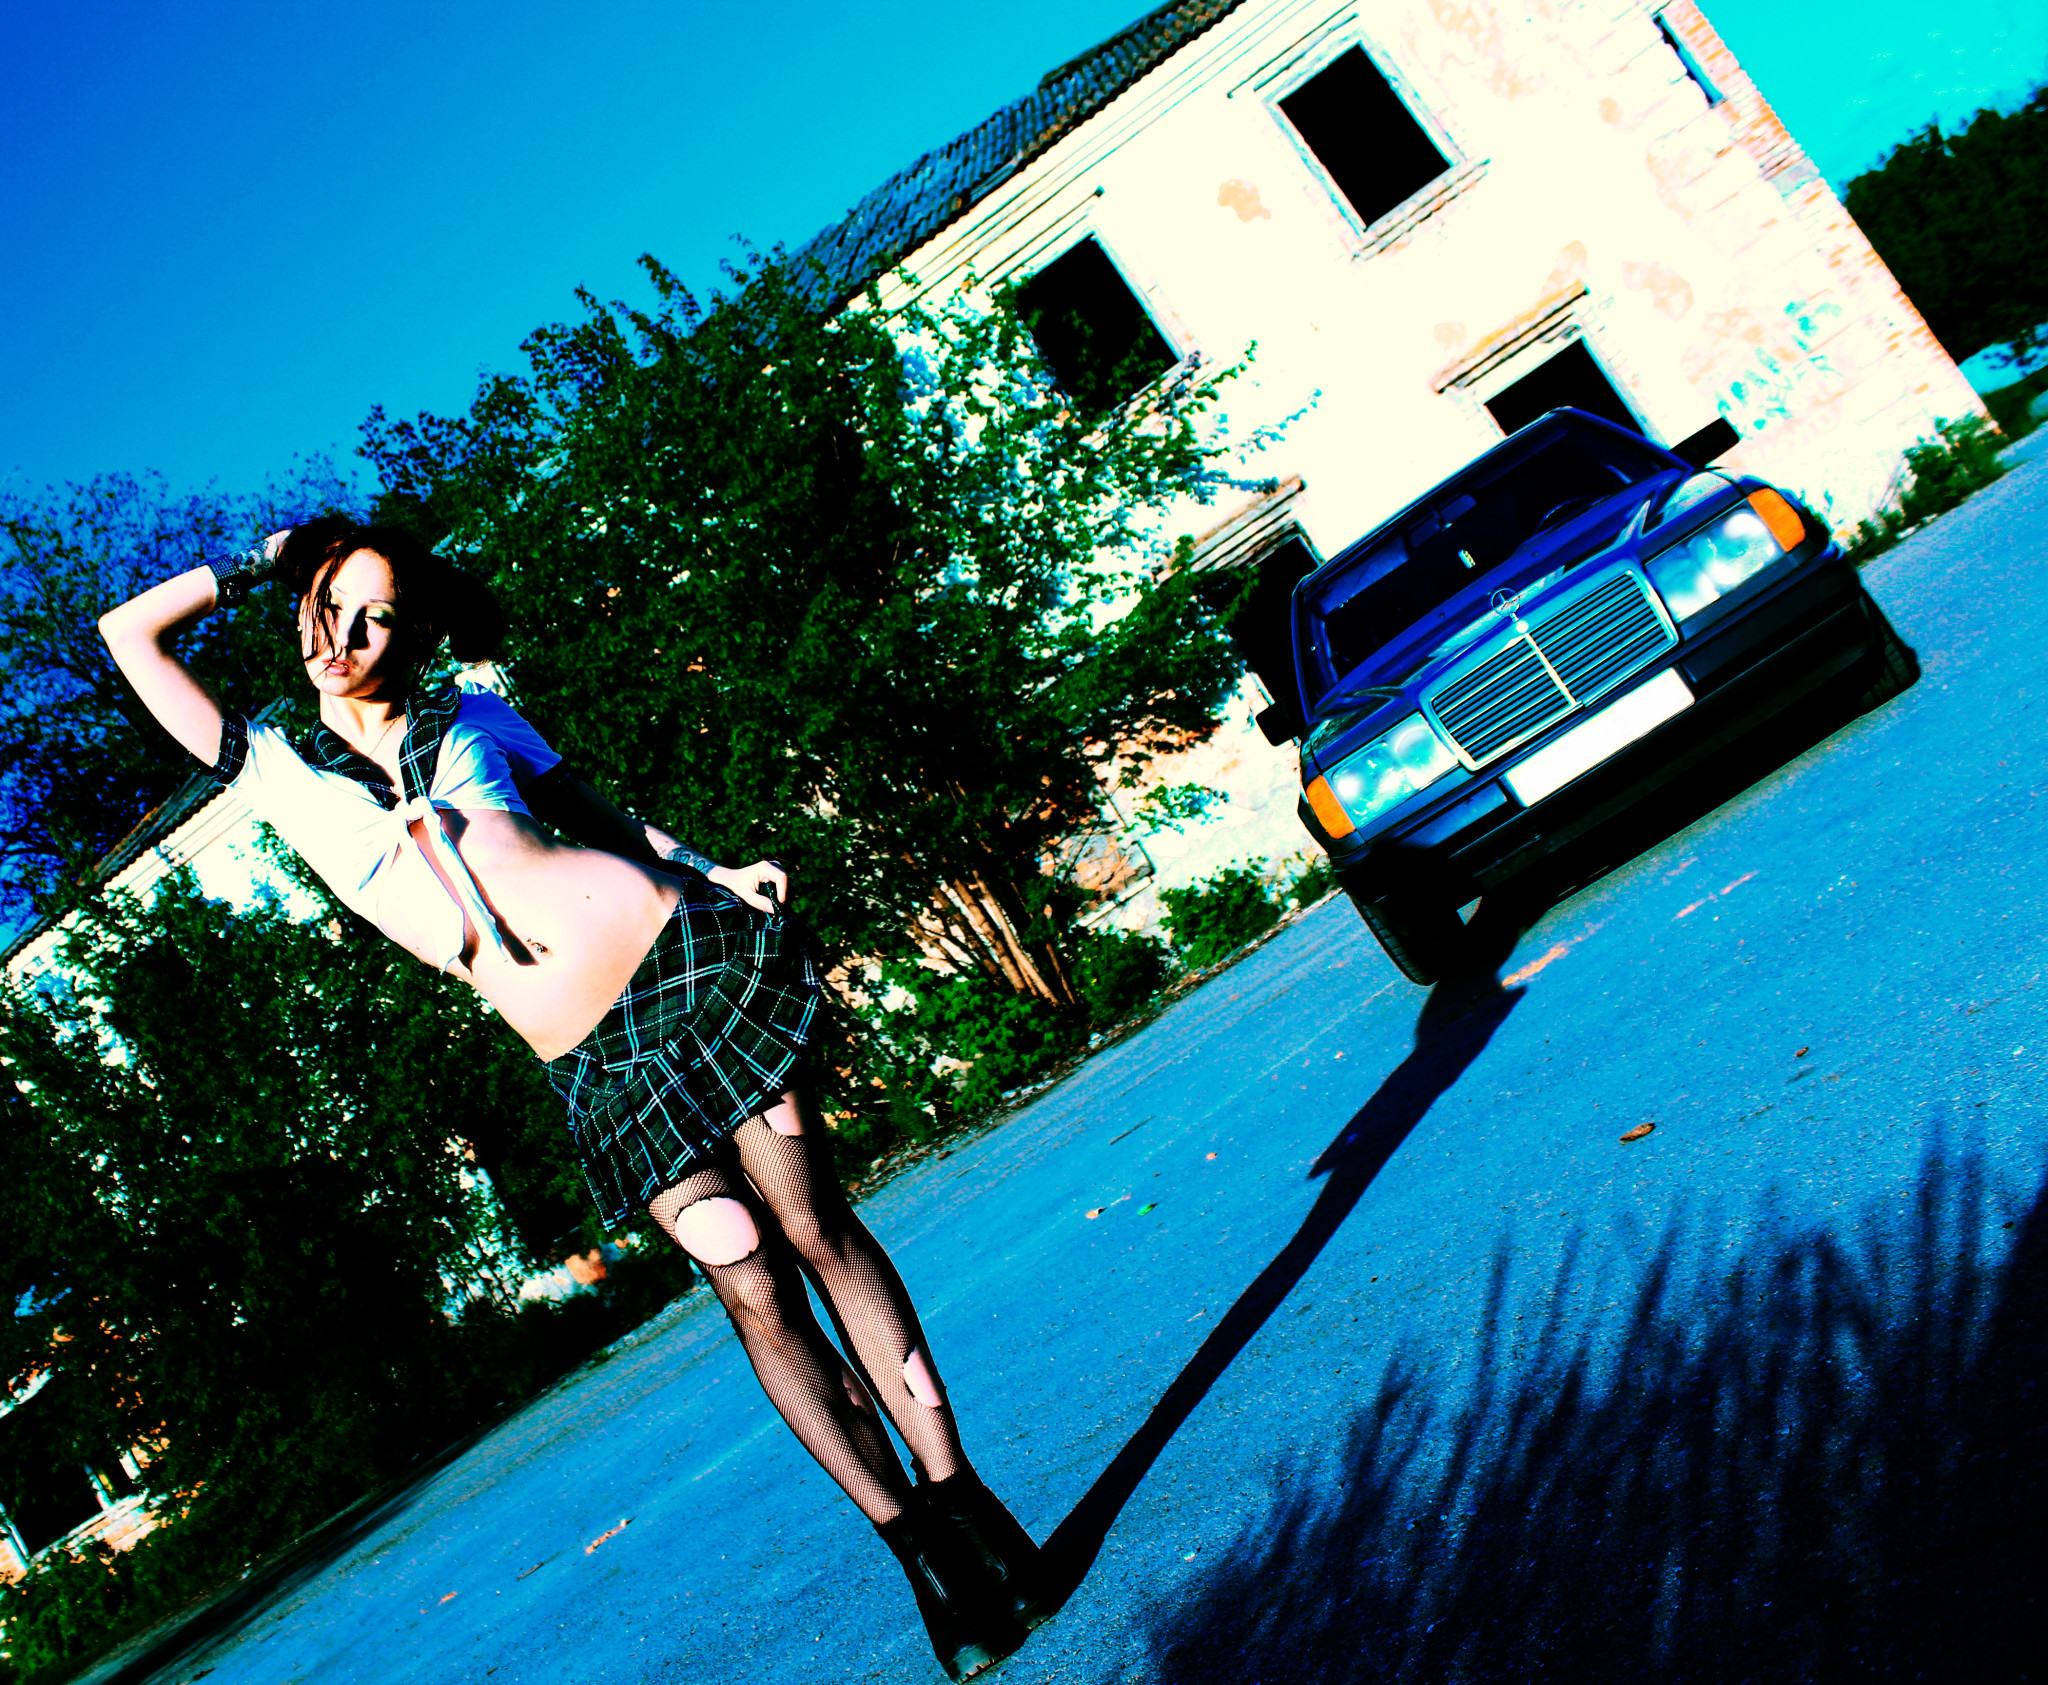 W124 фото с девушкой